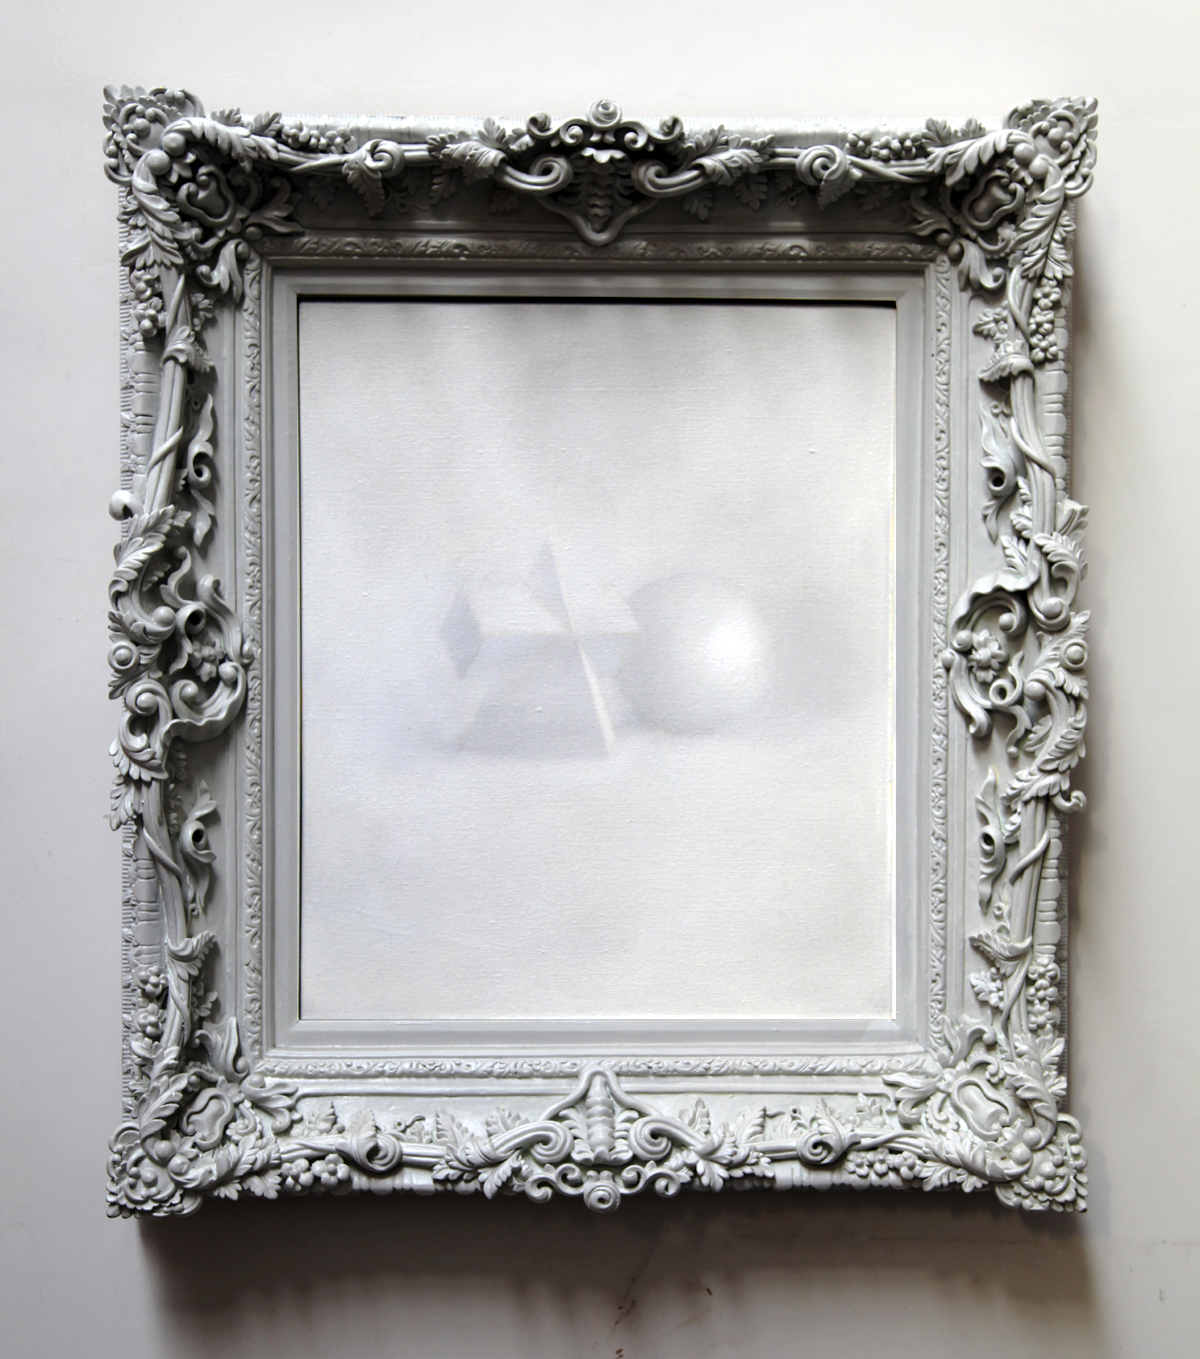 Gao Weigang 高伟刚, Misapprehend 误会, 2008-2012, Oil on canvas 布面油画, 88 x 78 cm